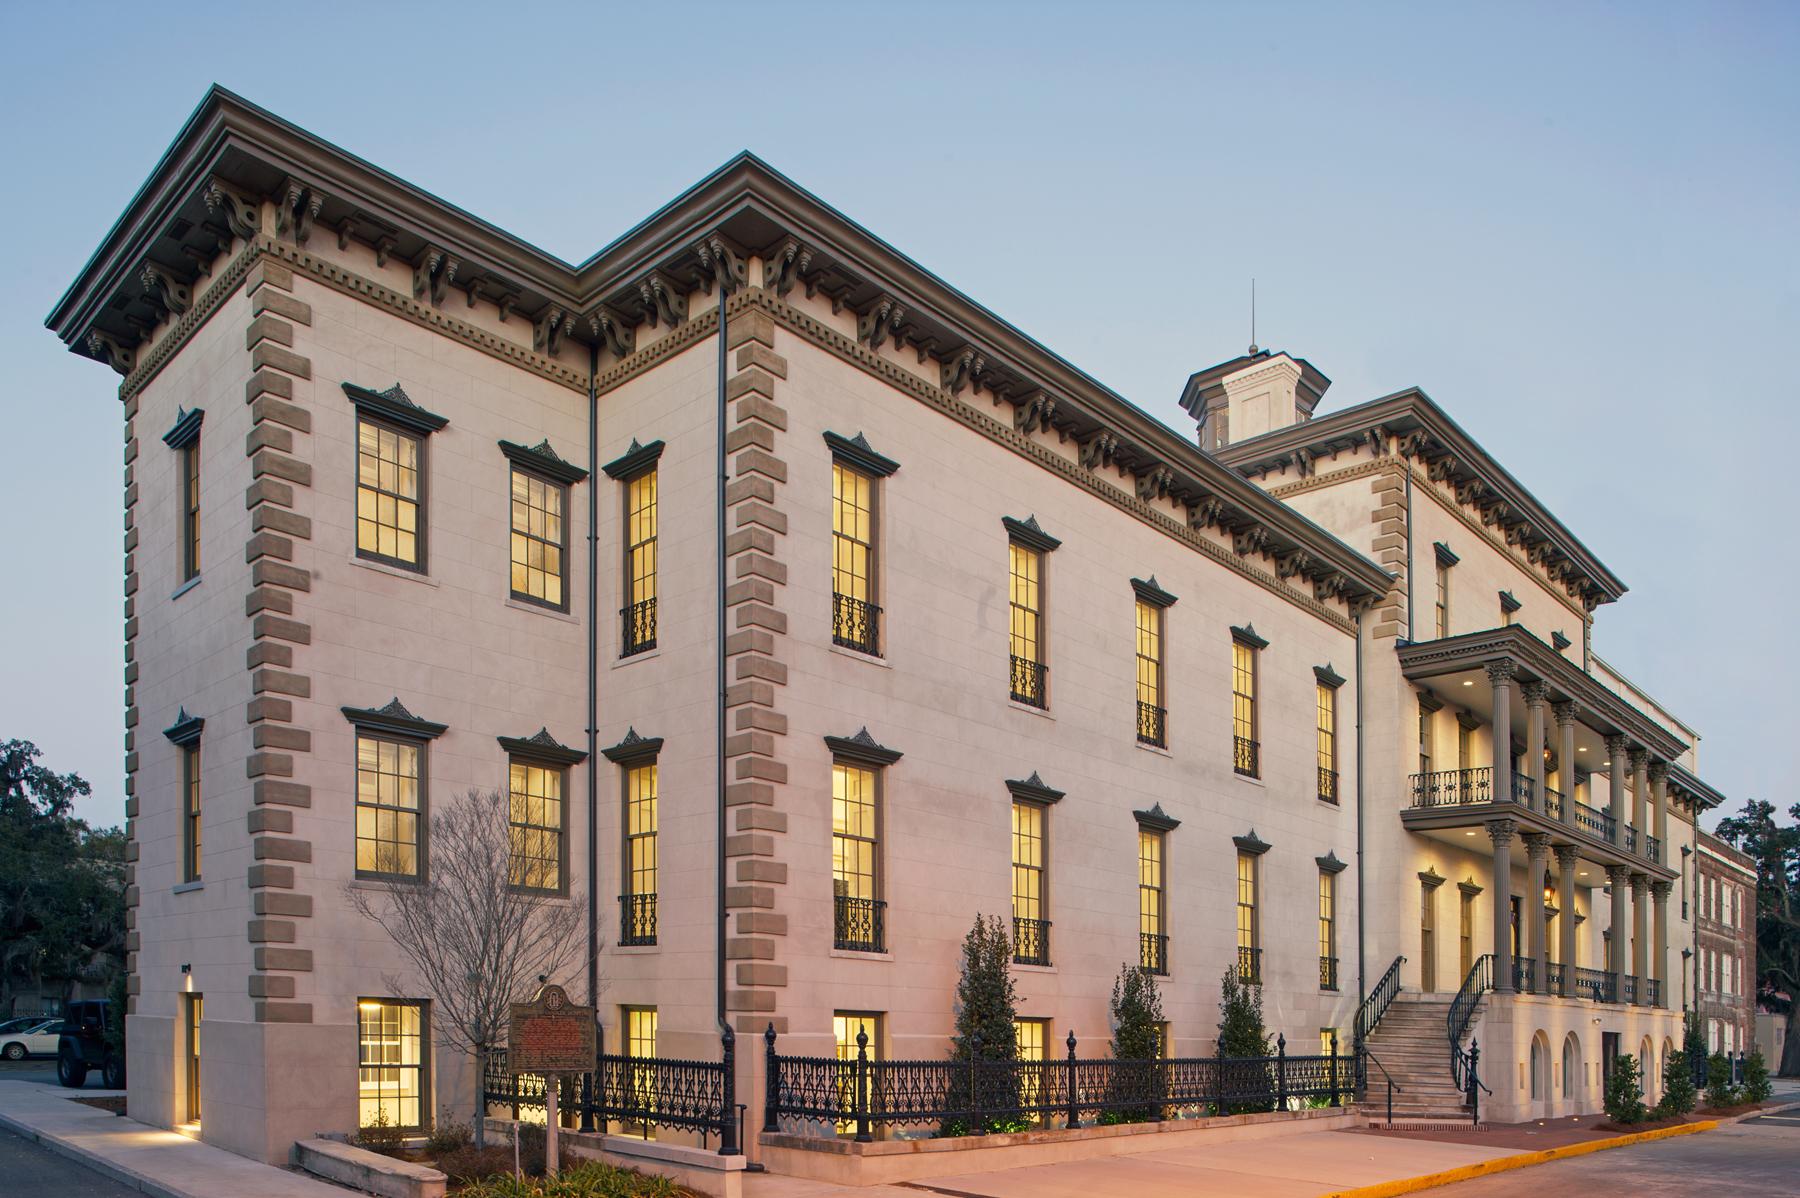 Candler Hospital in Savannah Georgia Ghosts